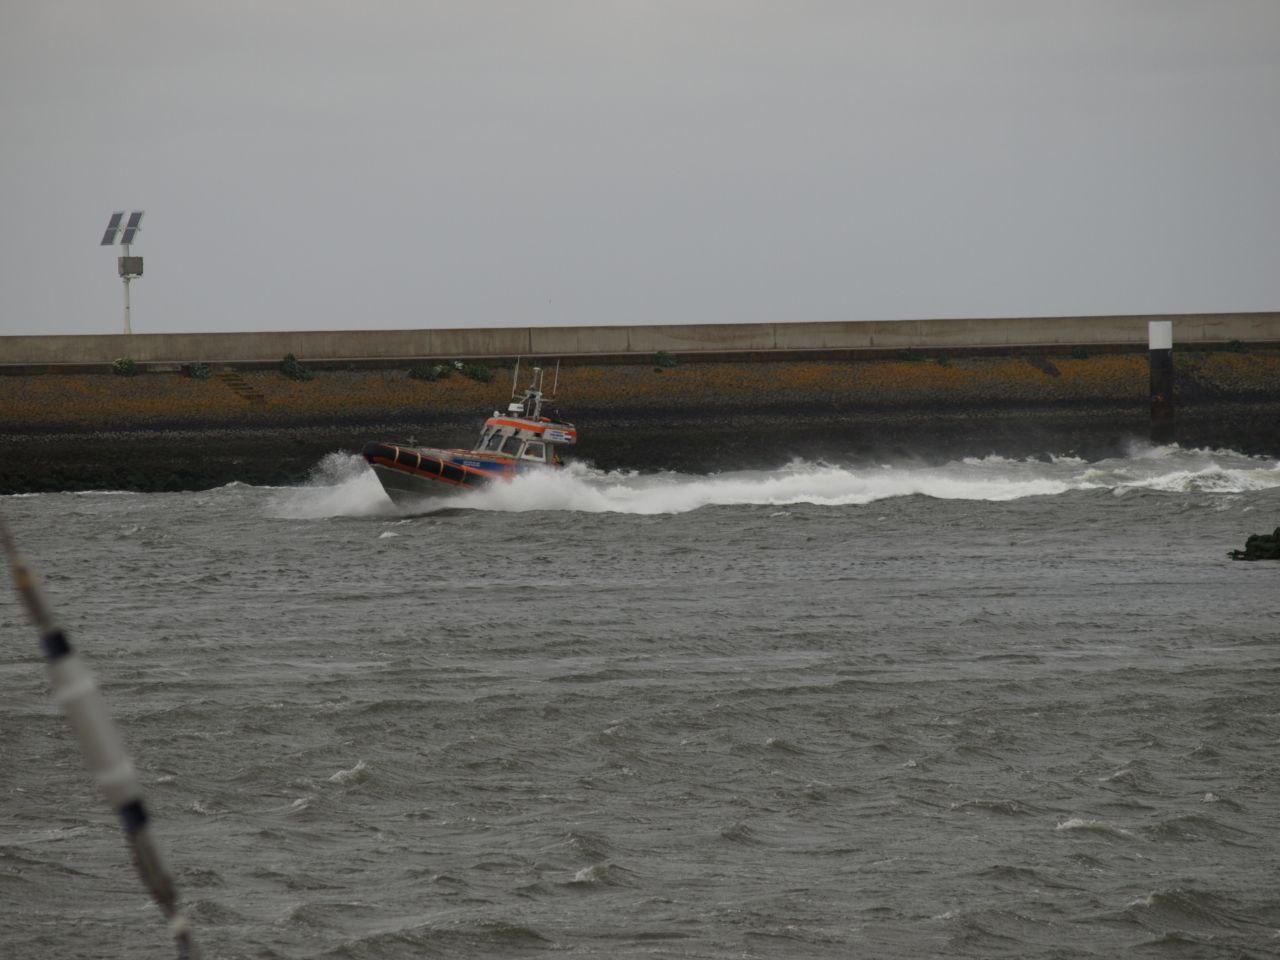 Kitesurfer in problemen bij Harlingen.